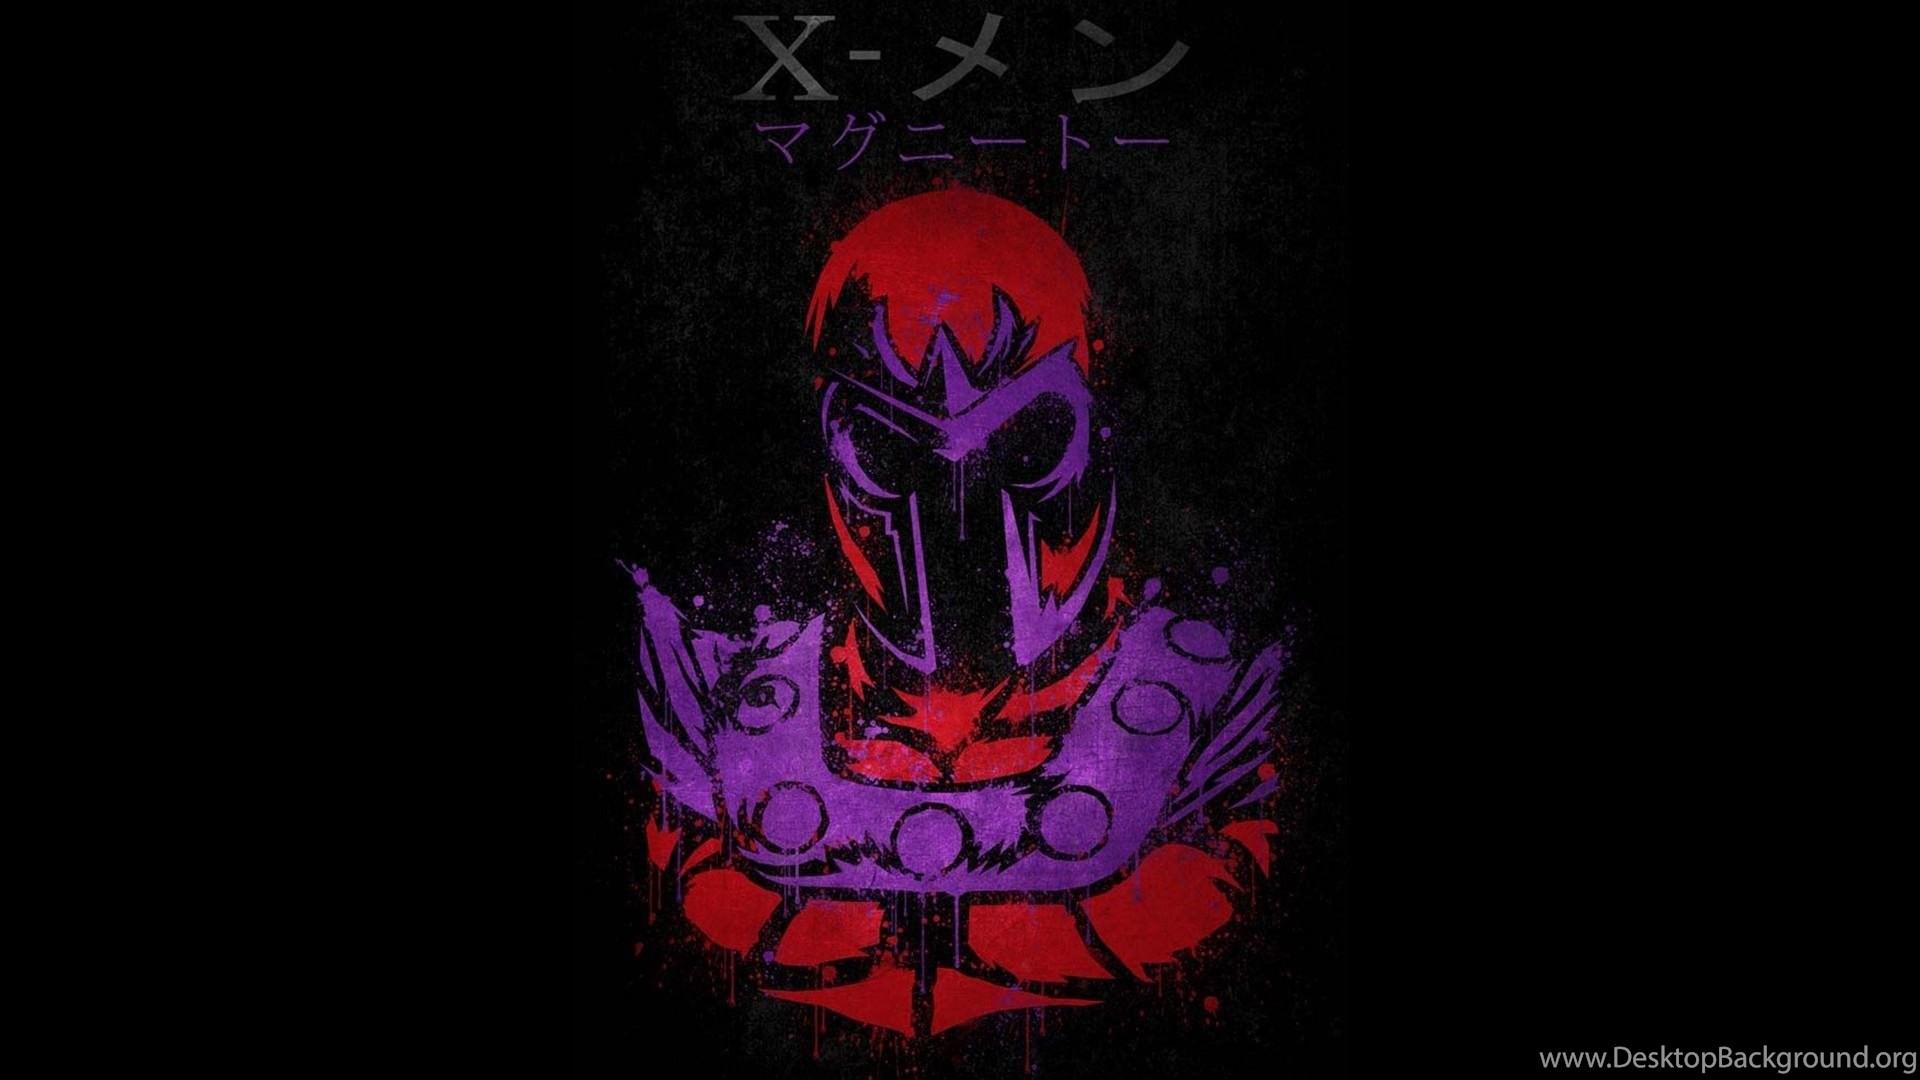 Magneto Marvel Comics X men Black Backgrounds Wallpapers Desktop 1920x1080